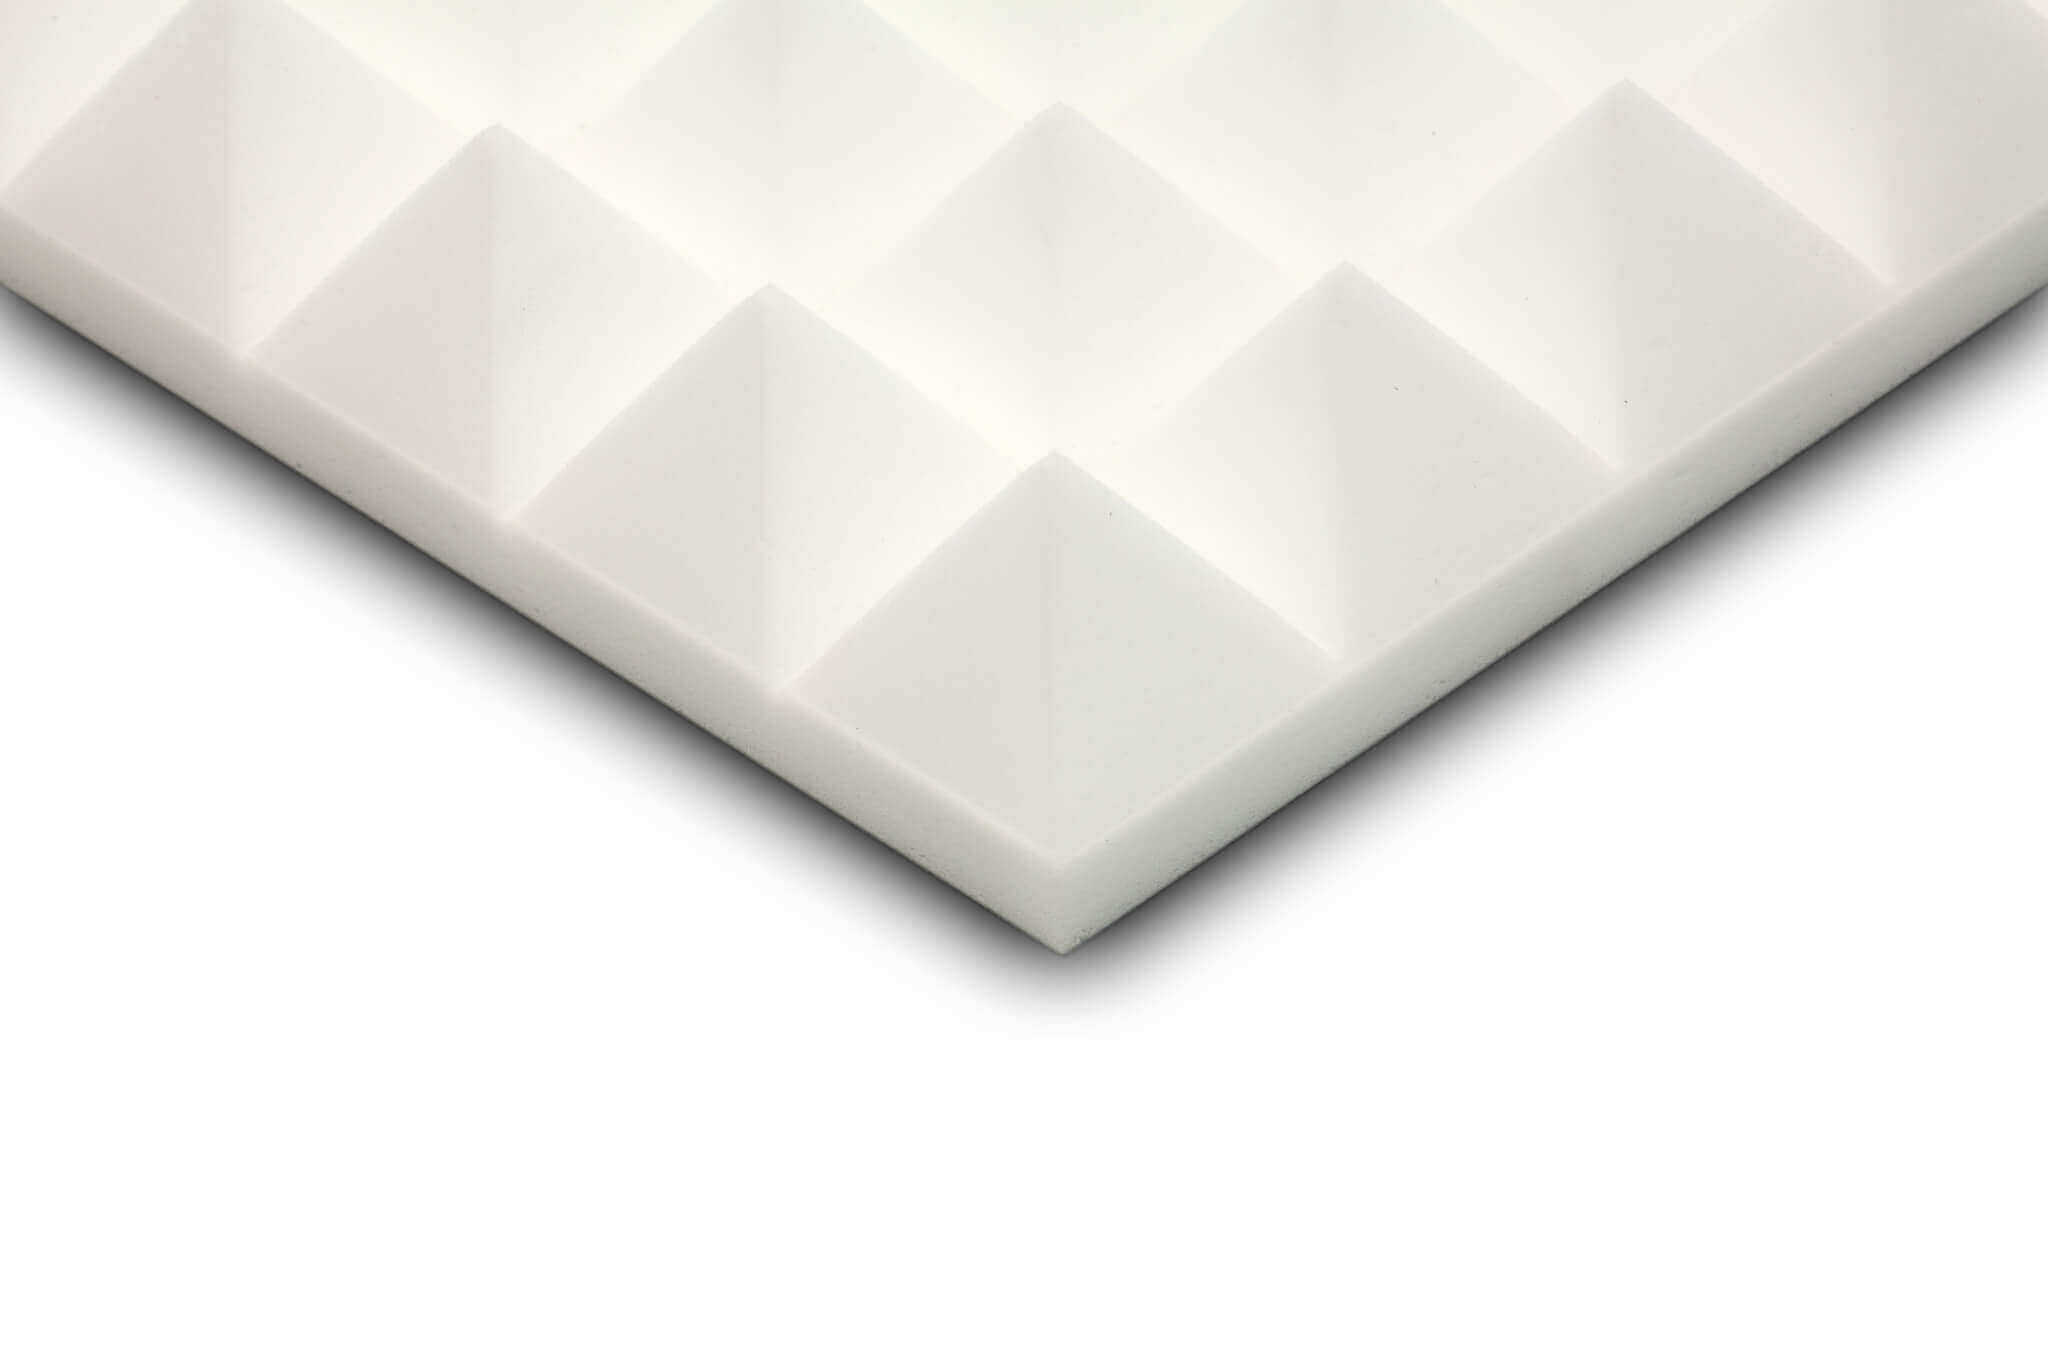 XB acoustics absorber-pyramis-basotect